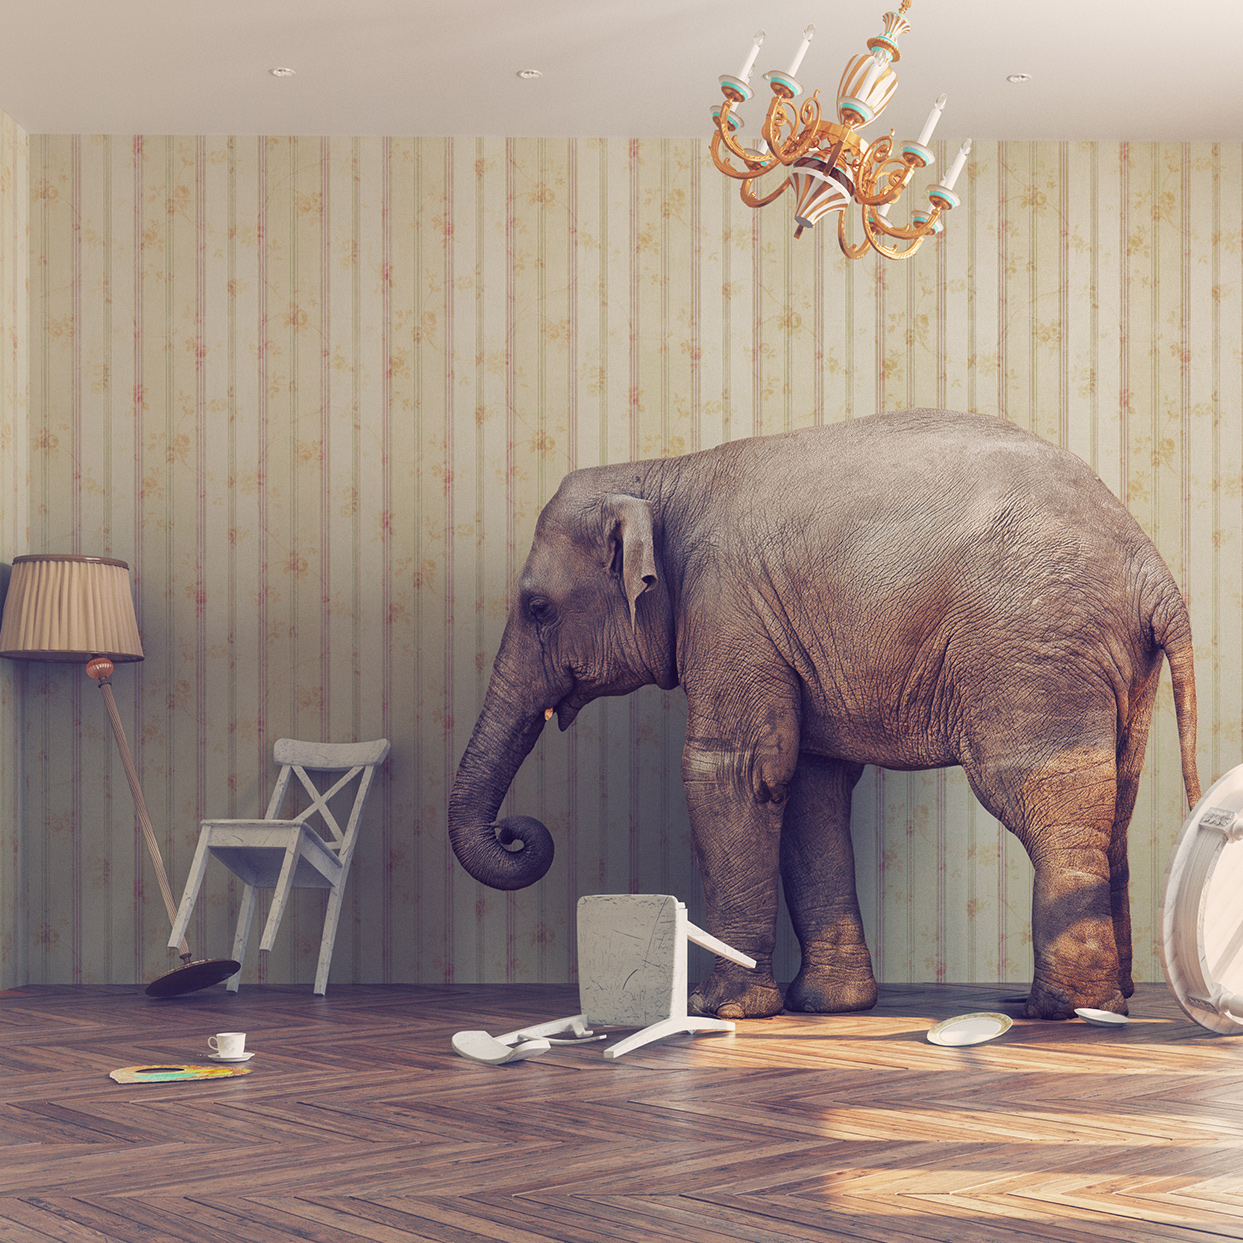 Six Elephants in the Room